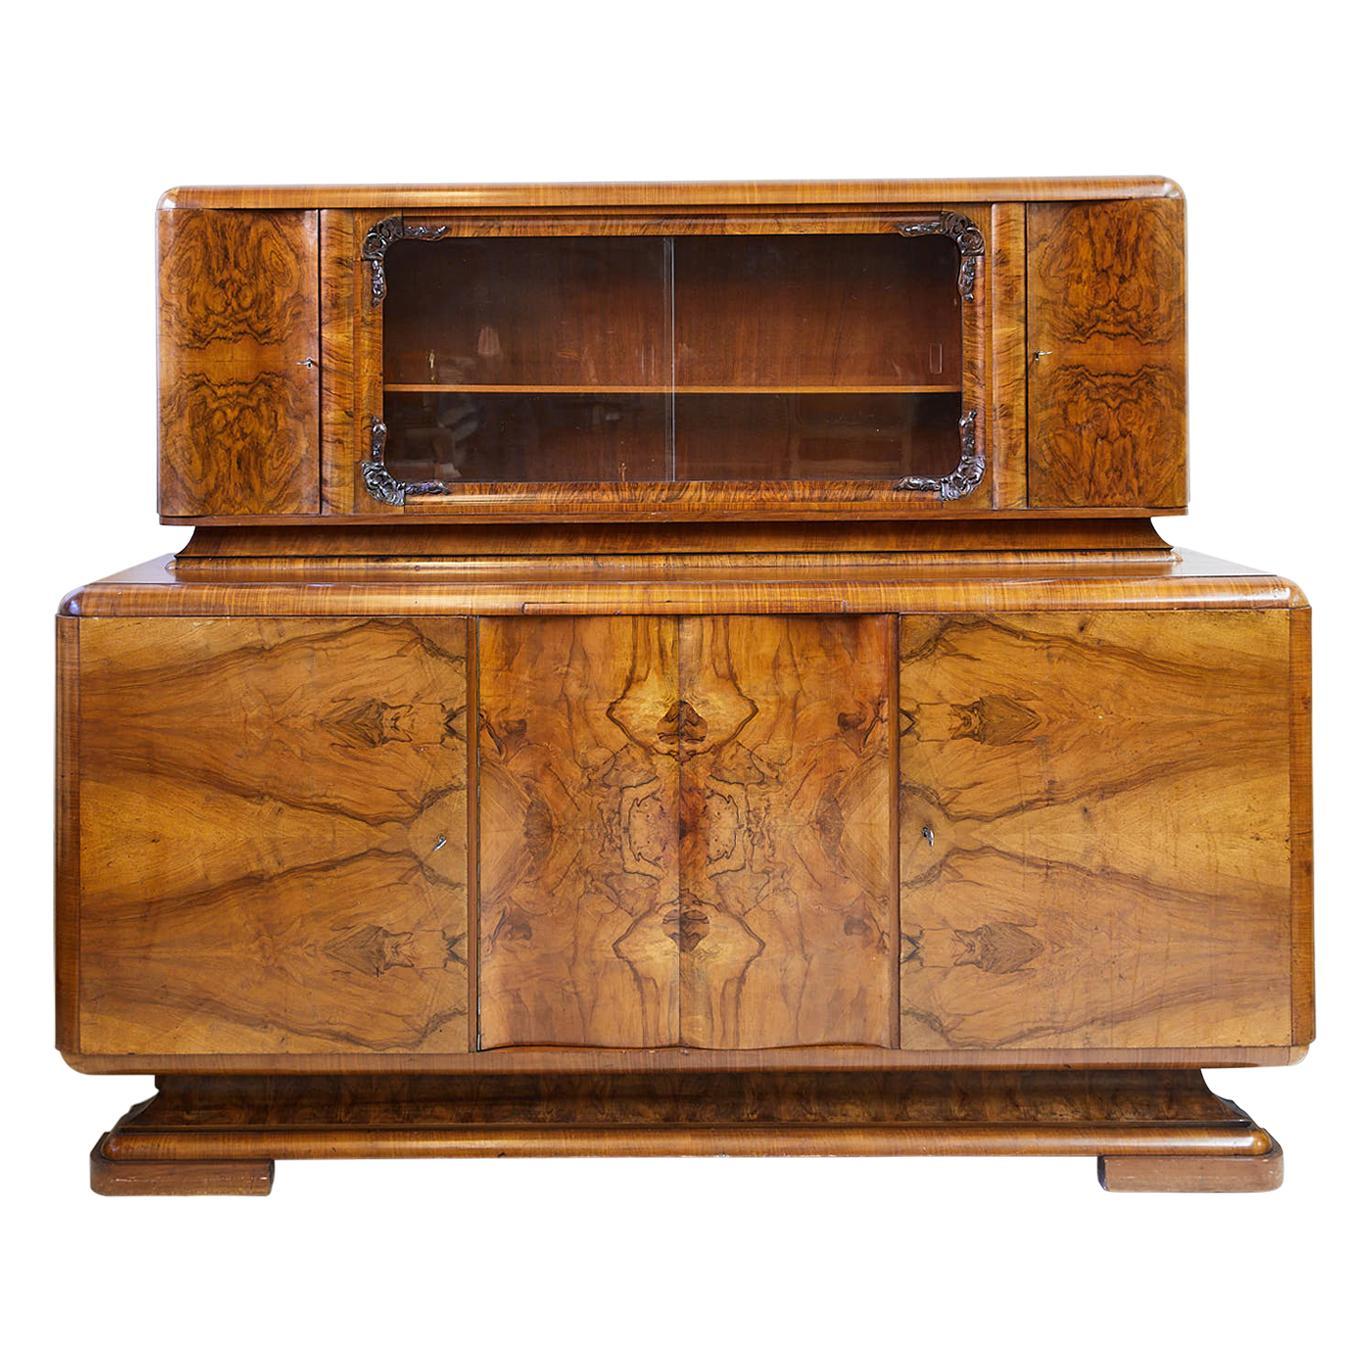 Art Deco Walnut Burl Wood Sideboard or Bar Cabinet